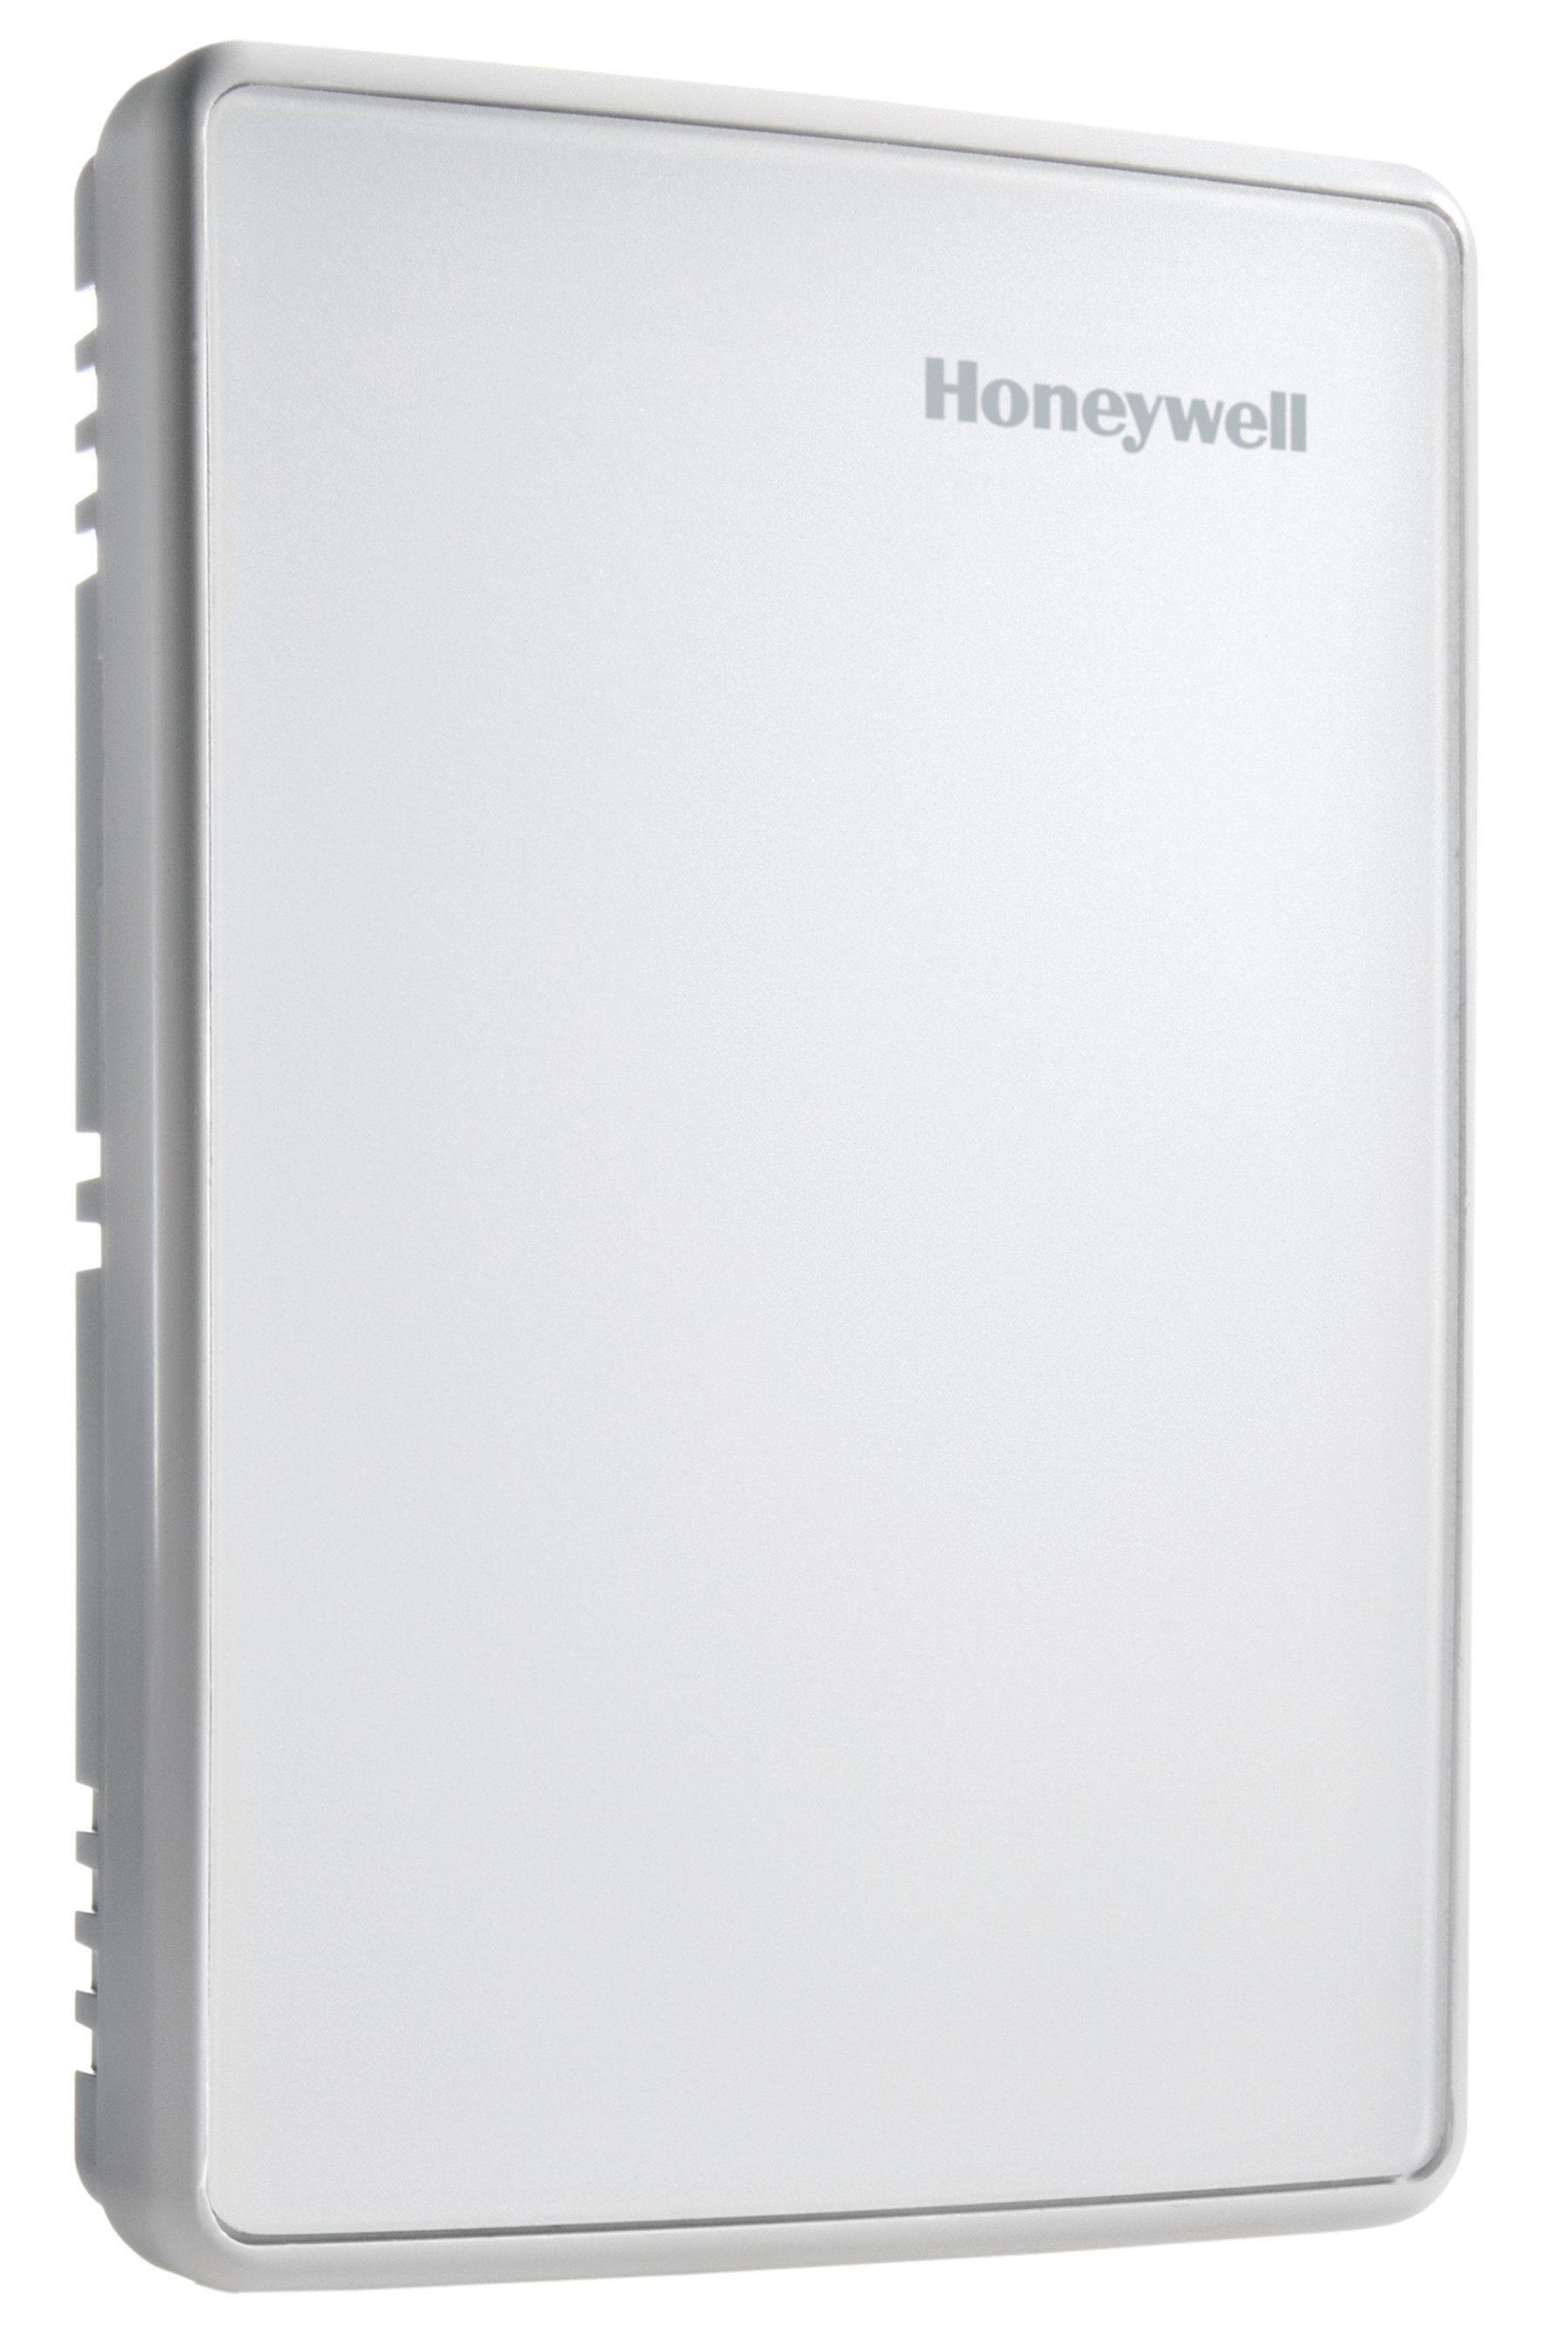 TR40 Honeywell Temperature Sensors